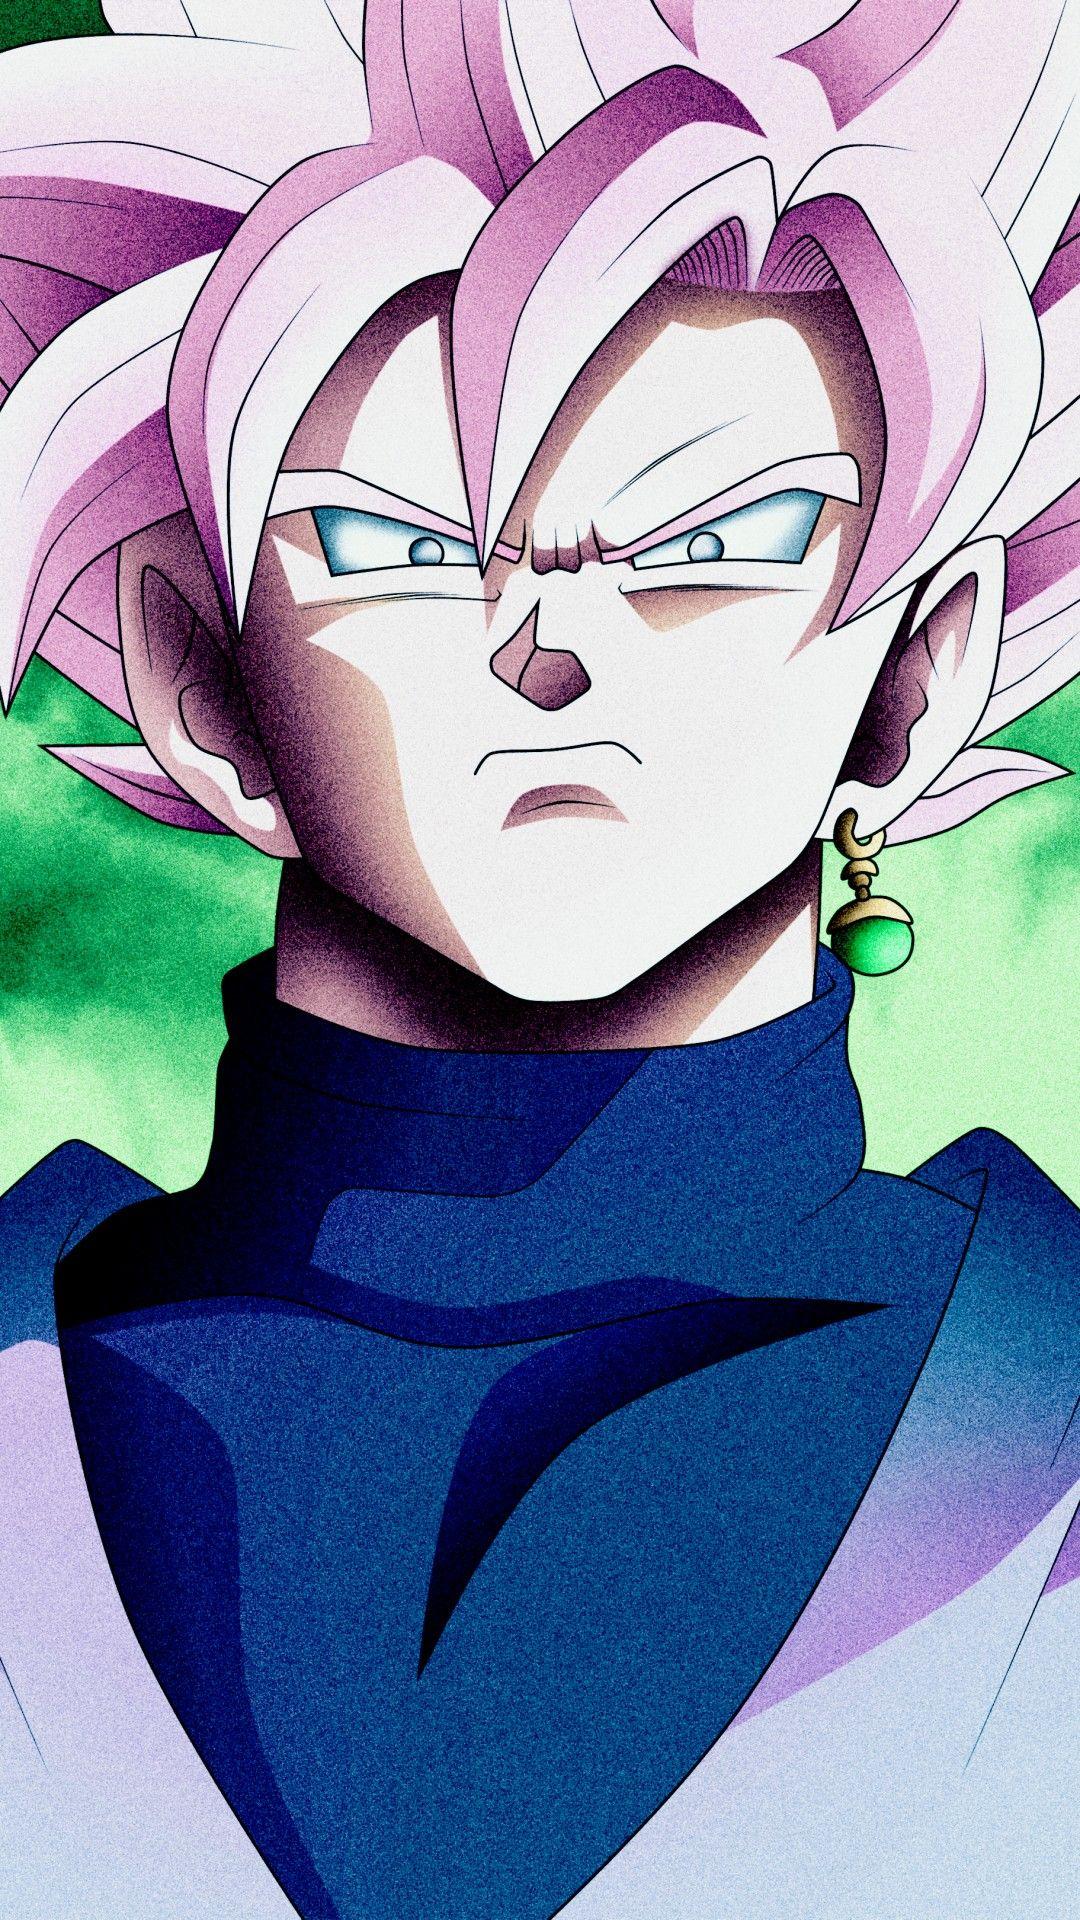 Super Saiyan Rose Black Goku Anime, Goku desenho, Dragon